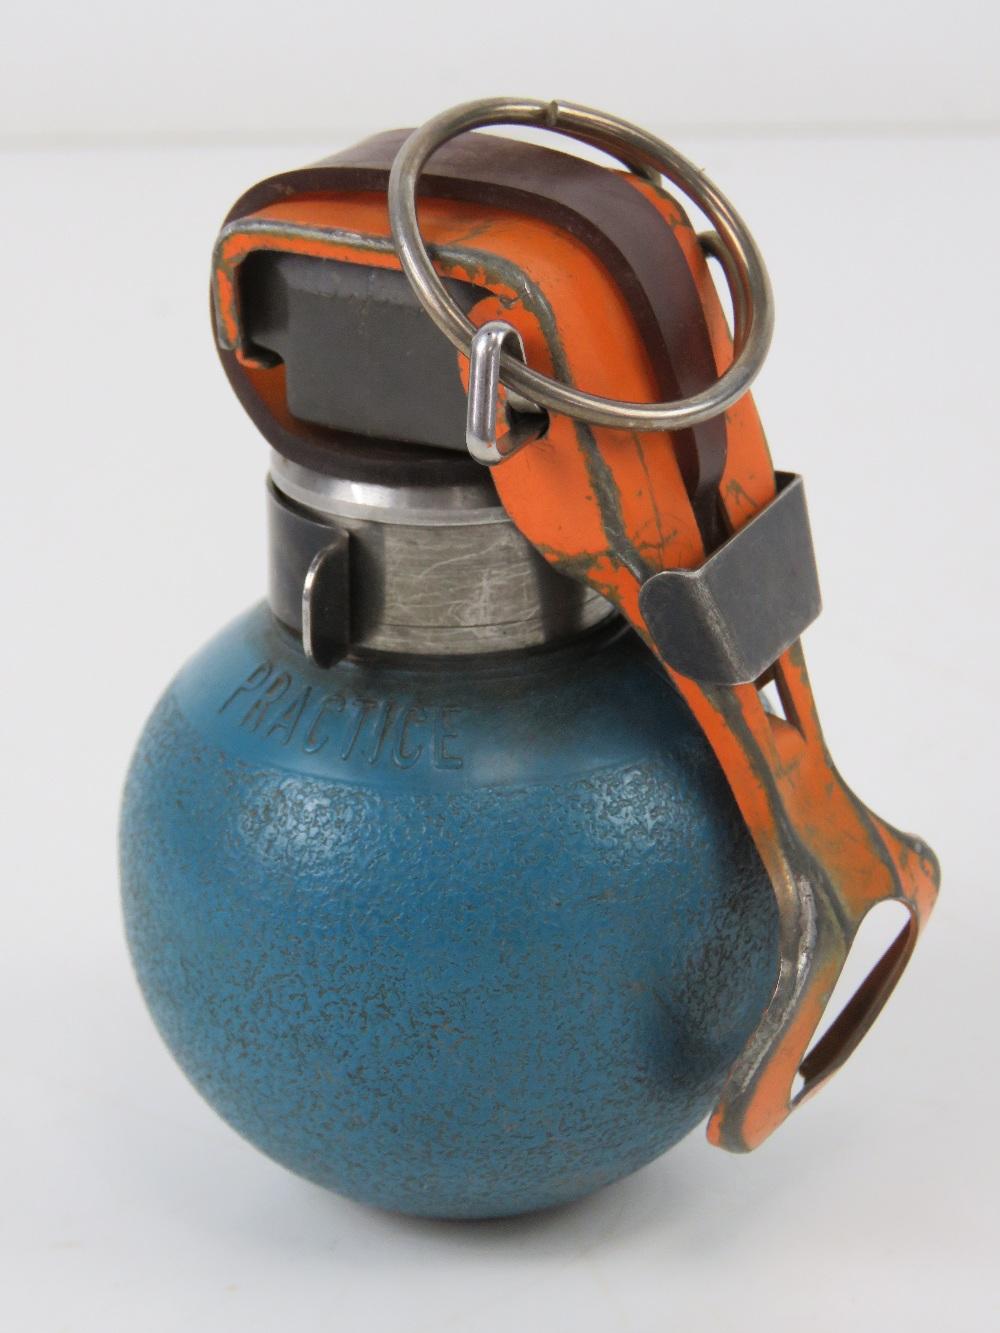 An inert British military L111 A1 B1 practice grenade.